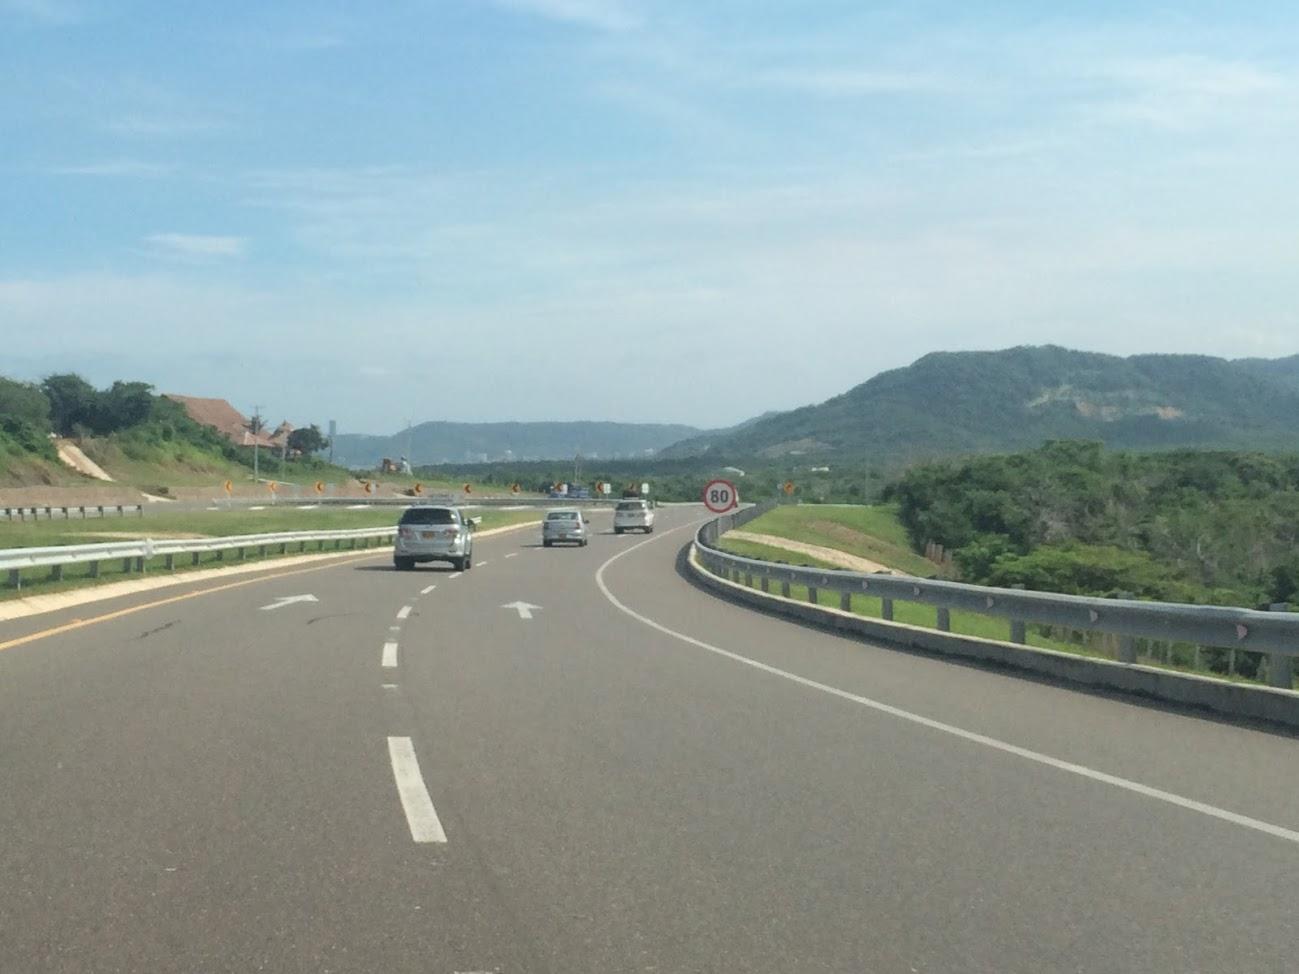 The roadside scenery was beautiful.